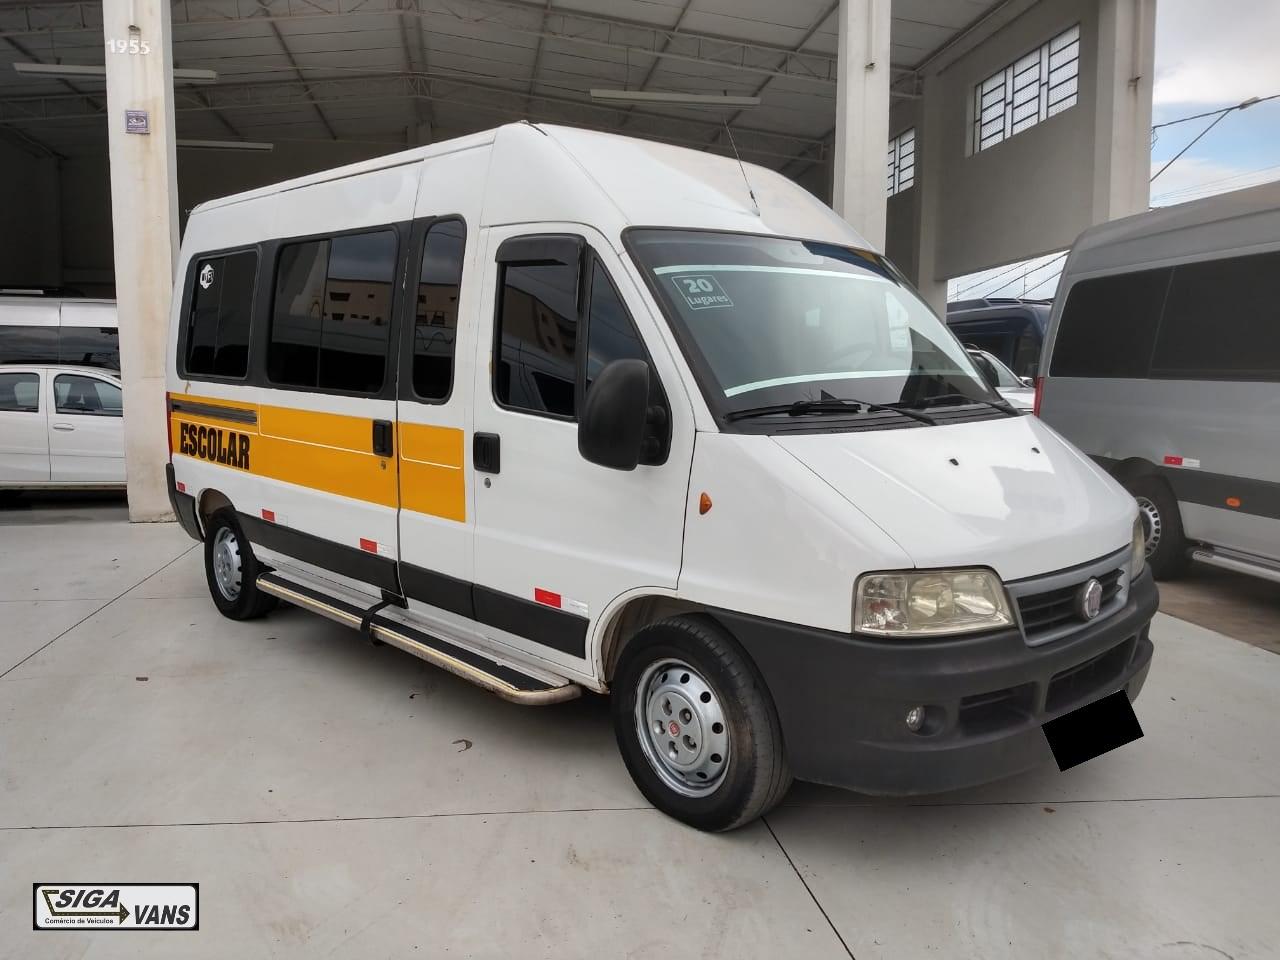 //www.autoline.com.br/carro/fiat/ducato-23-minibus-16l-me-16v-diesel-4p-turbo-manual/2012/americana-sp/12113147